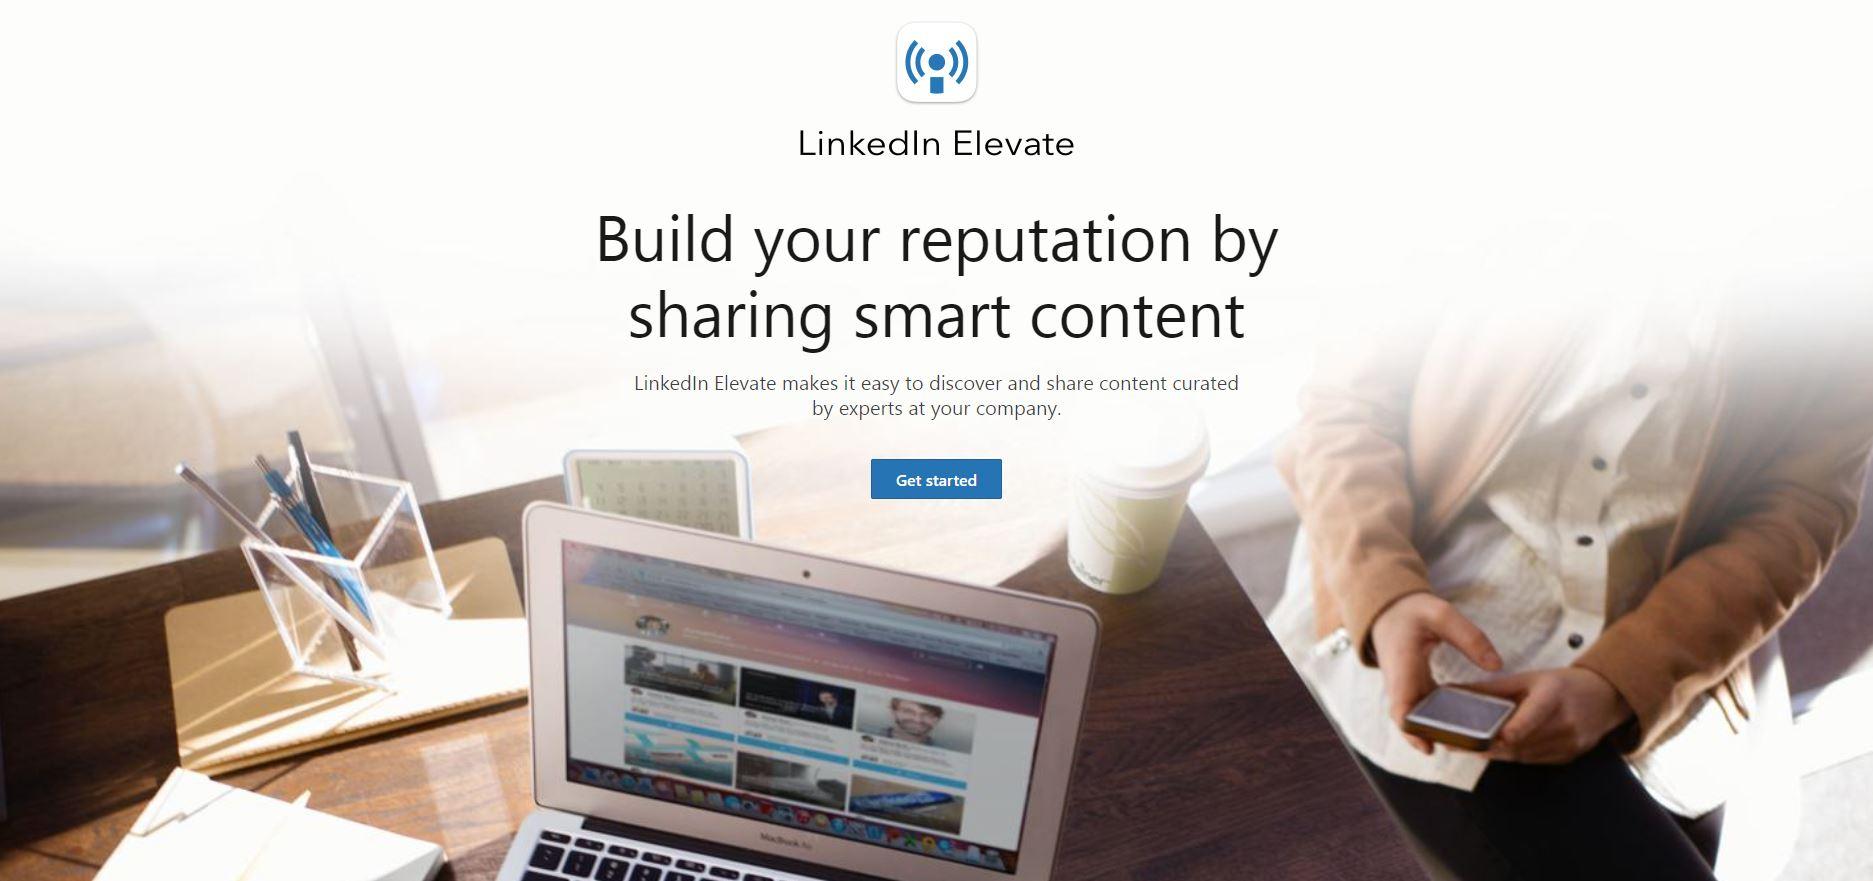 LinkedIn Elevate Employee Advocacy Tools